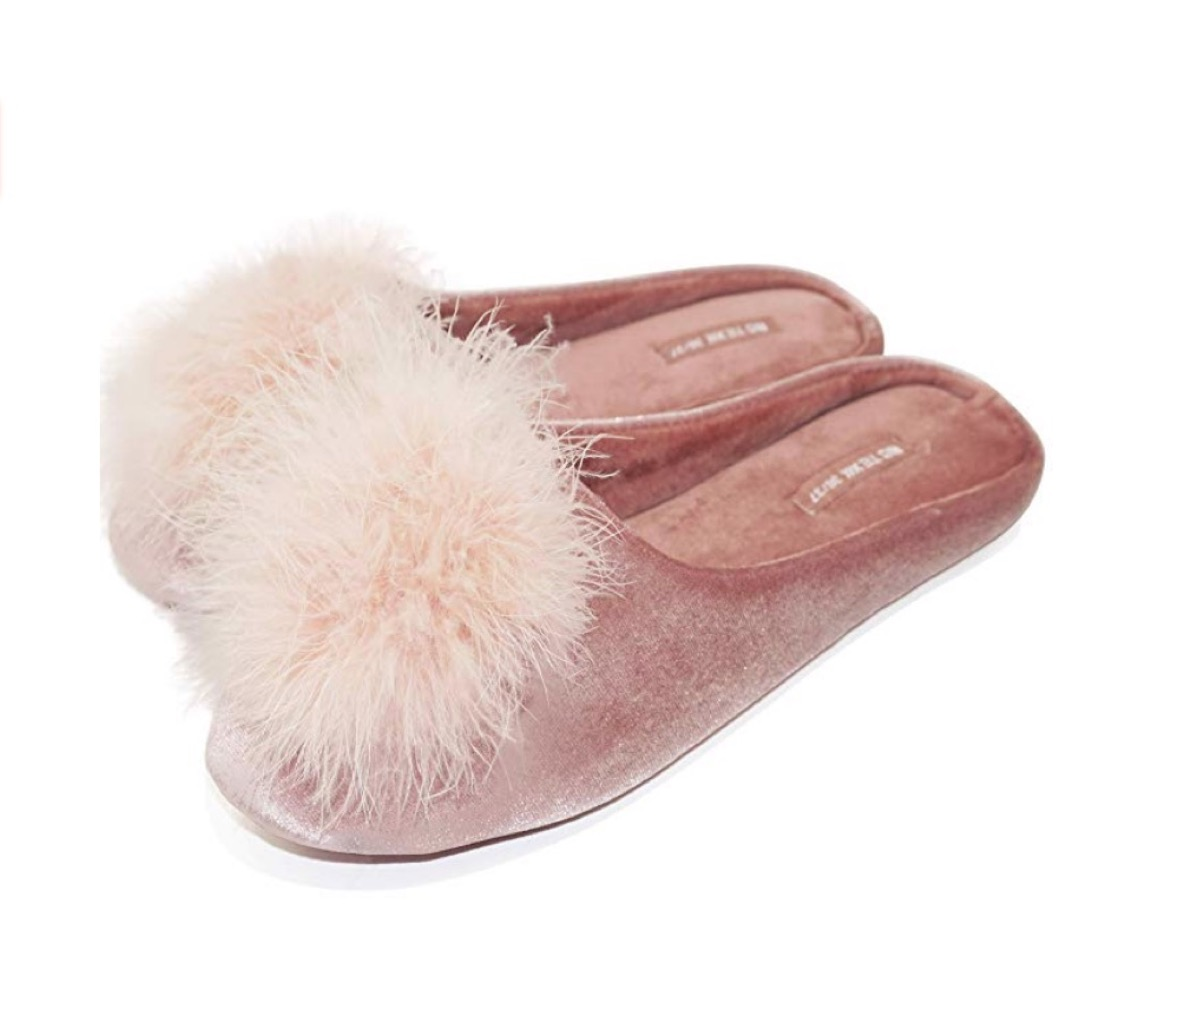 pink velvet slippers with pink fur pom poms